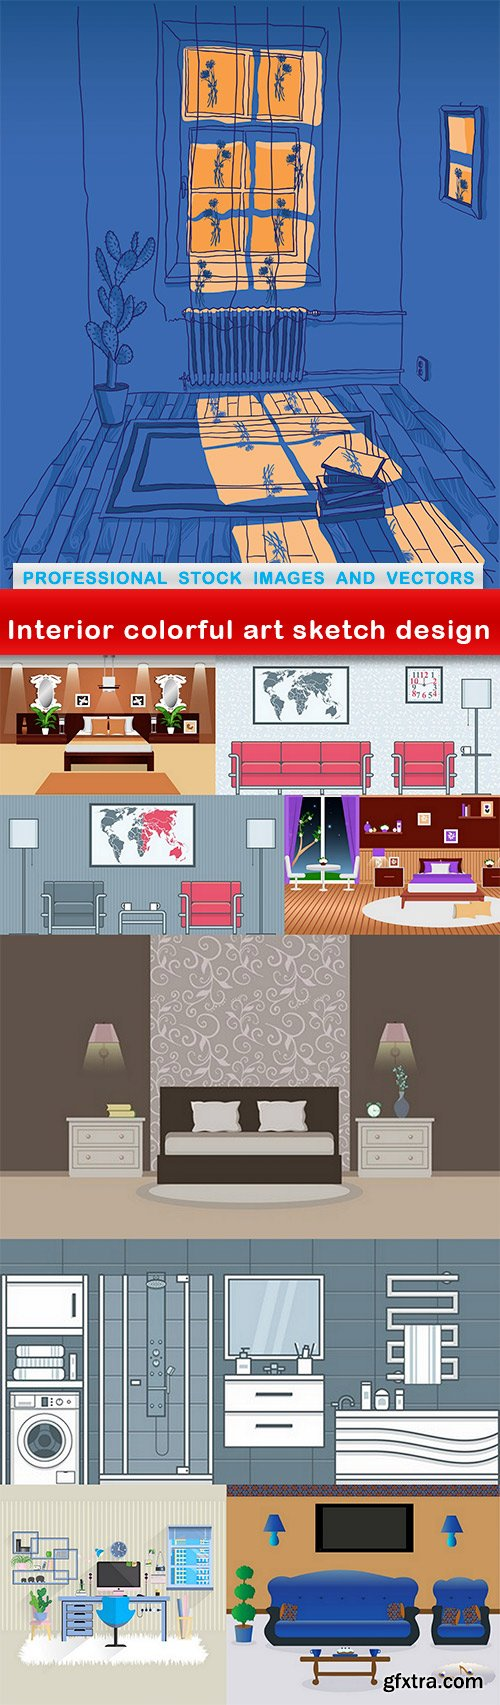 Interior colorful art sketch design - 9 EPS